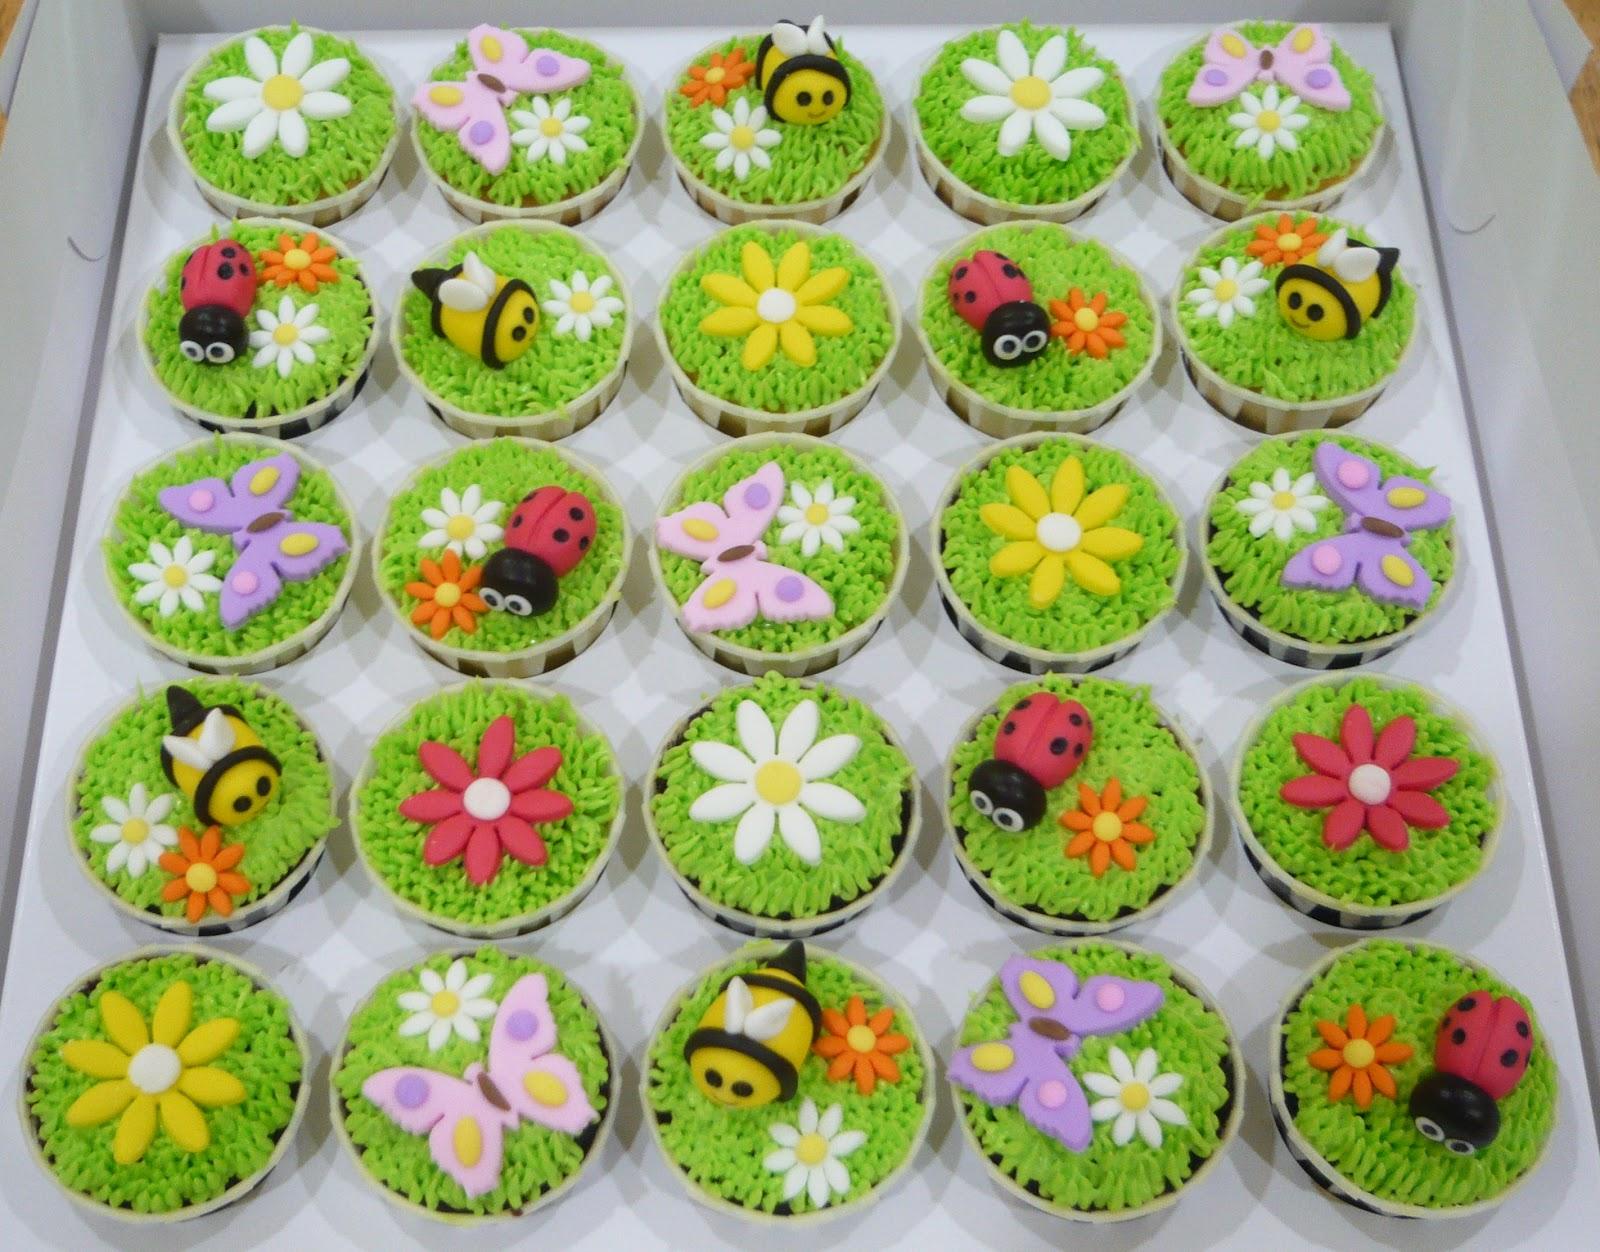 Jenn Cupcakes & Muffins: Garden themed Cupcakes